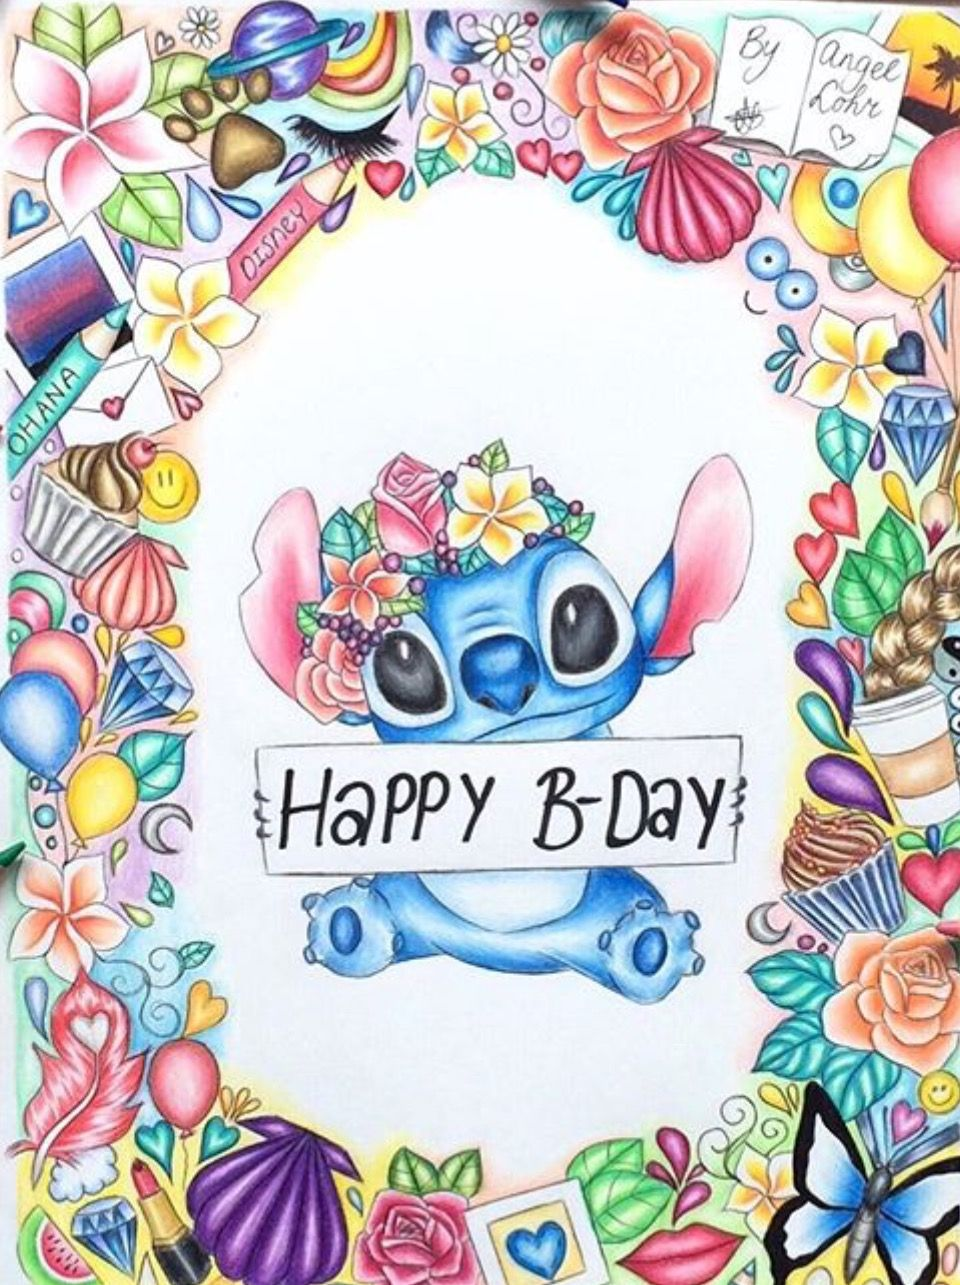 happy birthday stitch Disney Stitch artwork | Disney | Disney, Disney drawings, Stitch happy birthday stitch